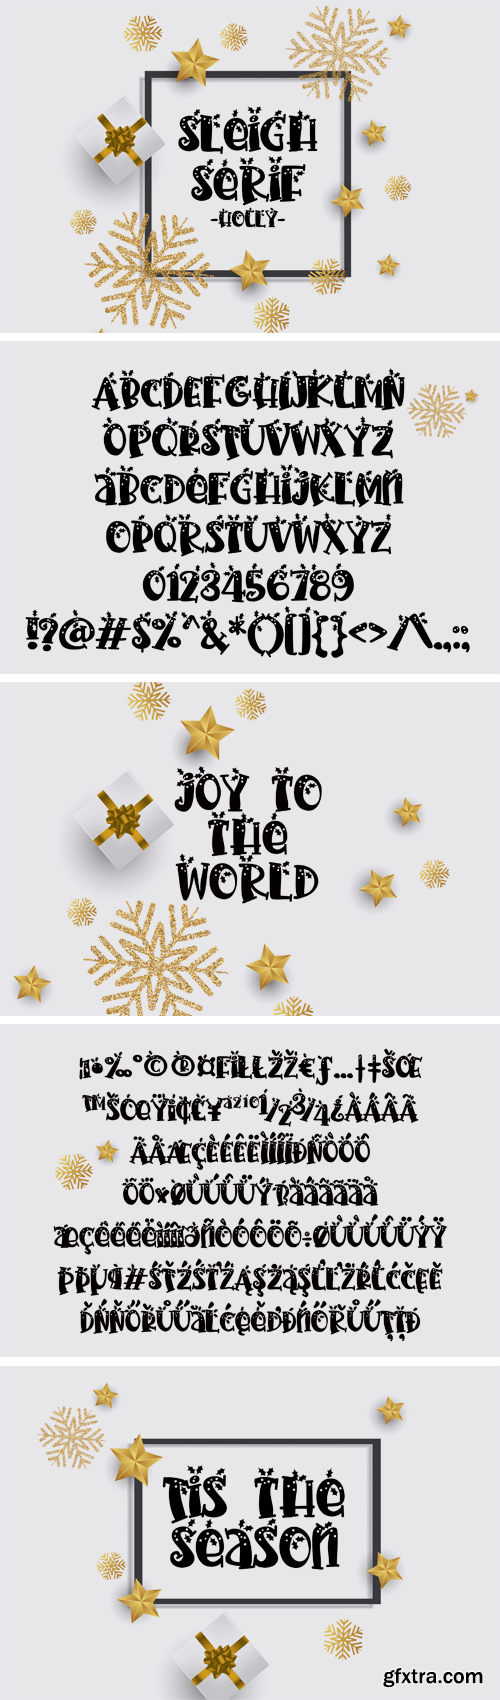 Fontbundles - PN Sleigh Serif Holly 181041